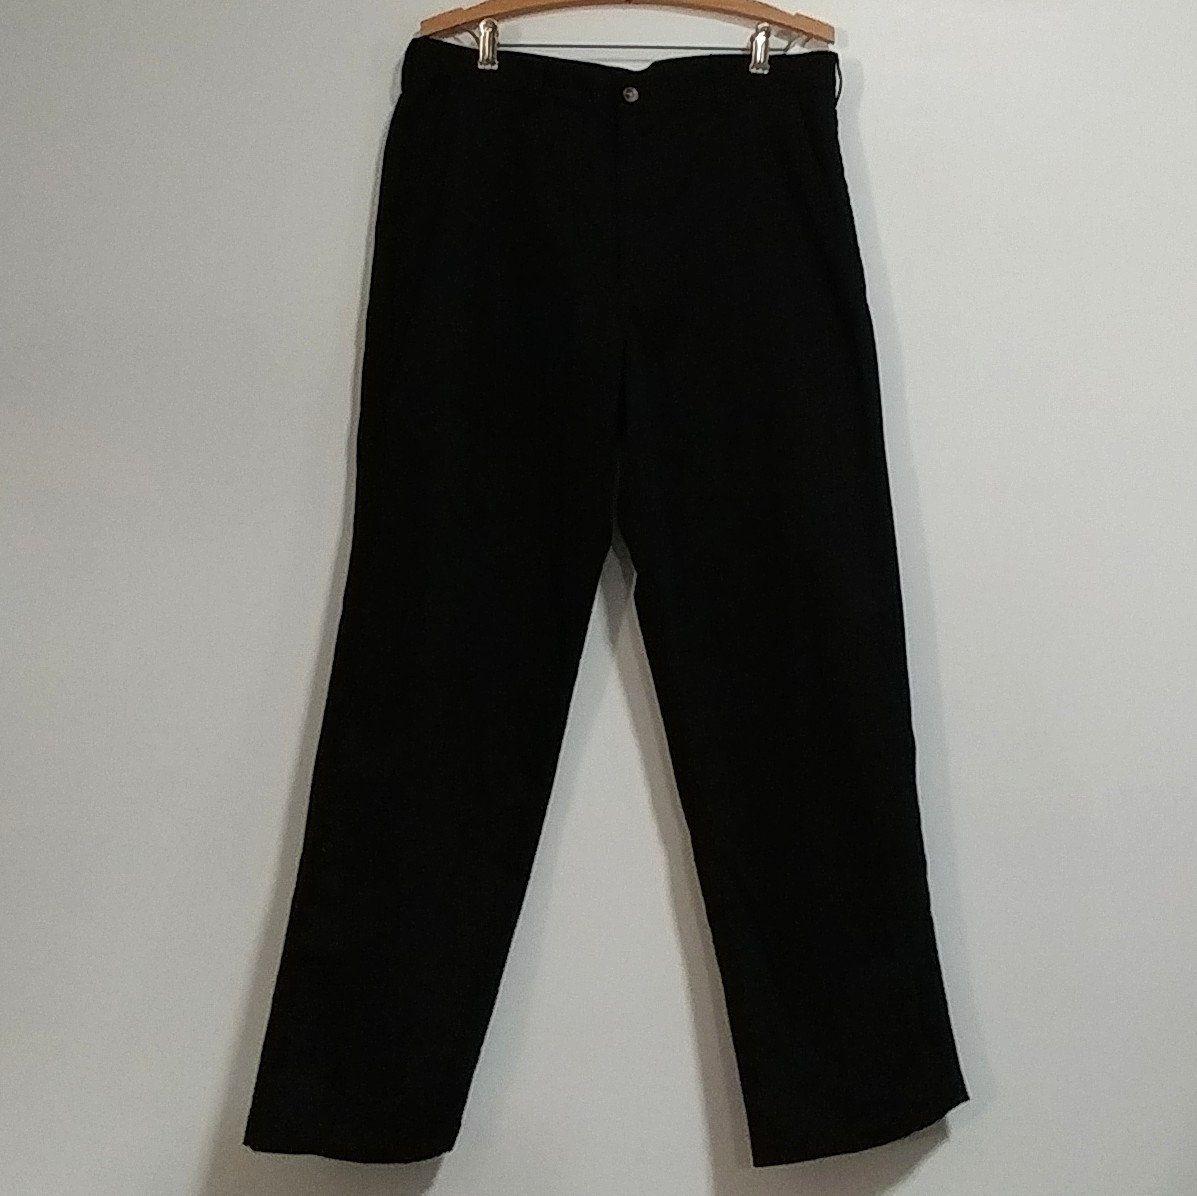 34x30 Rise 14 High Waist Solid Black Dress Slacks George Brand Straight Leg 4 Pocket 8 Belt Loops Tailor Polyester Cotton Trousers Menswear Black Dress Slacks Dress Slacks Solid Black Dress [ 1196 x 1197 Pixel ]